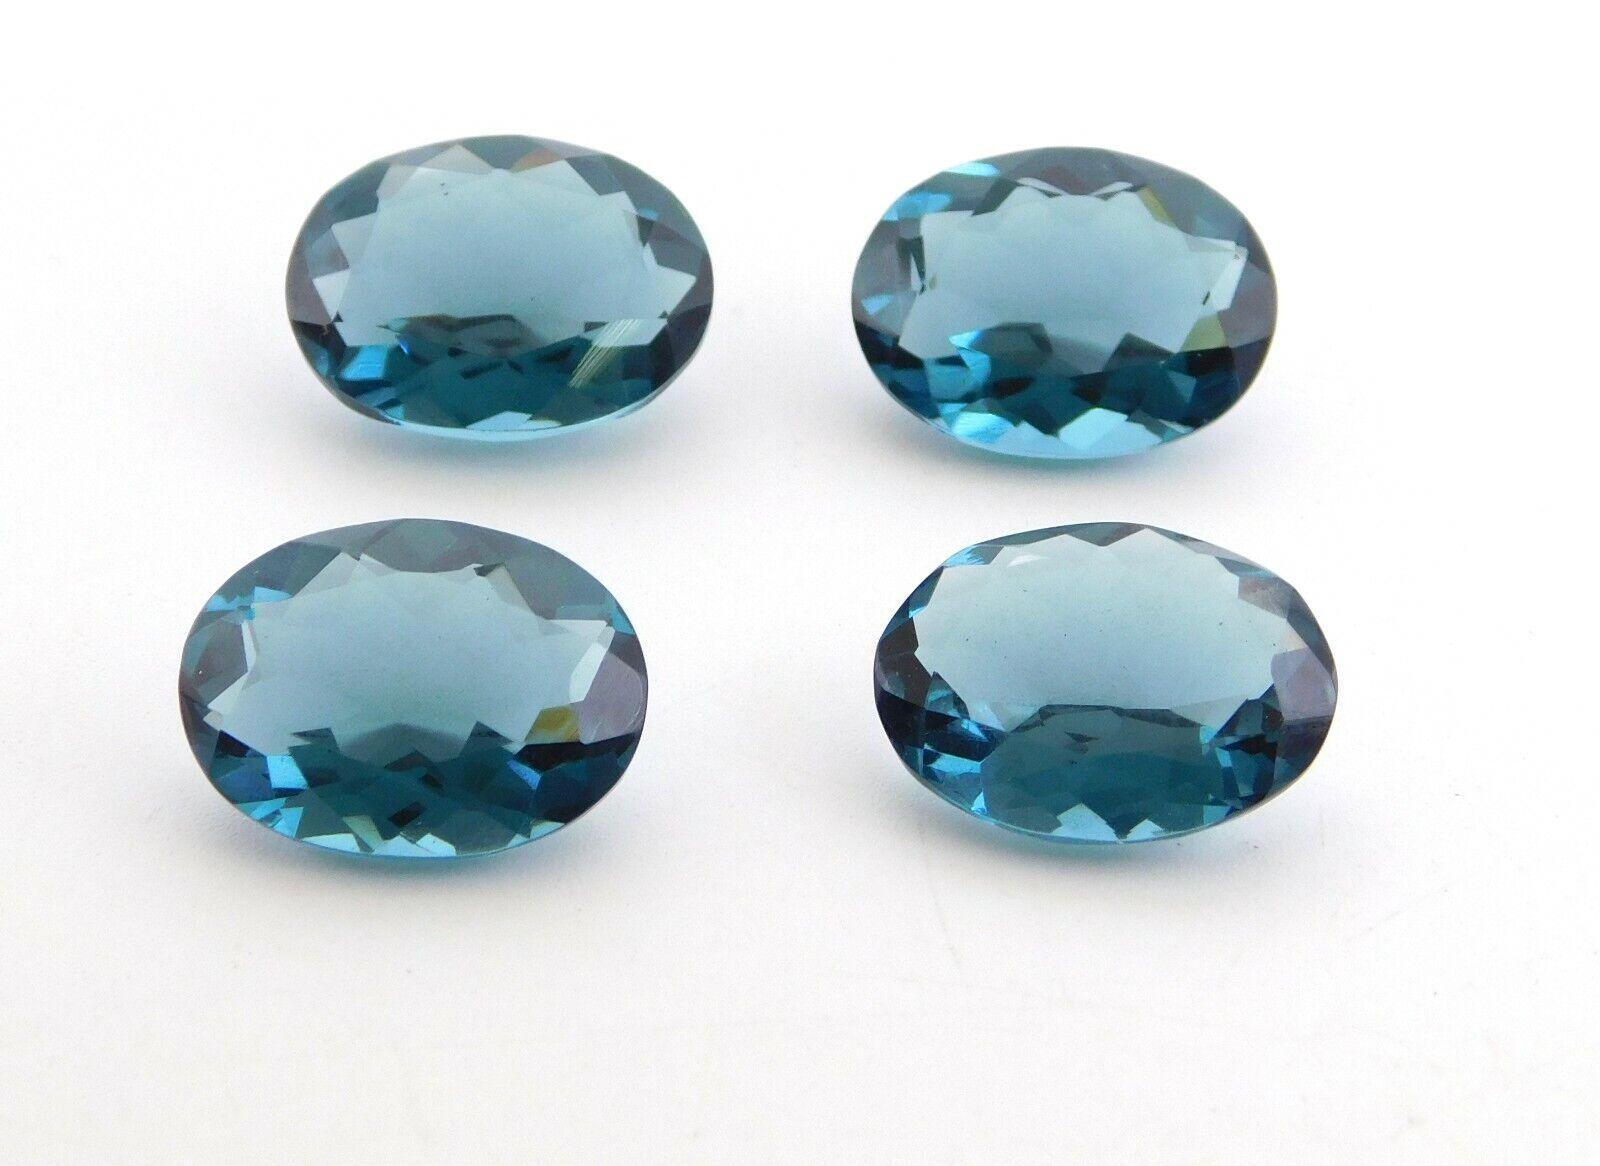 15 X 20 MM Oval Good Quality Hydro London Blue Topaz Cut Loose Gemstones P-703